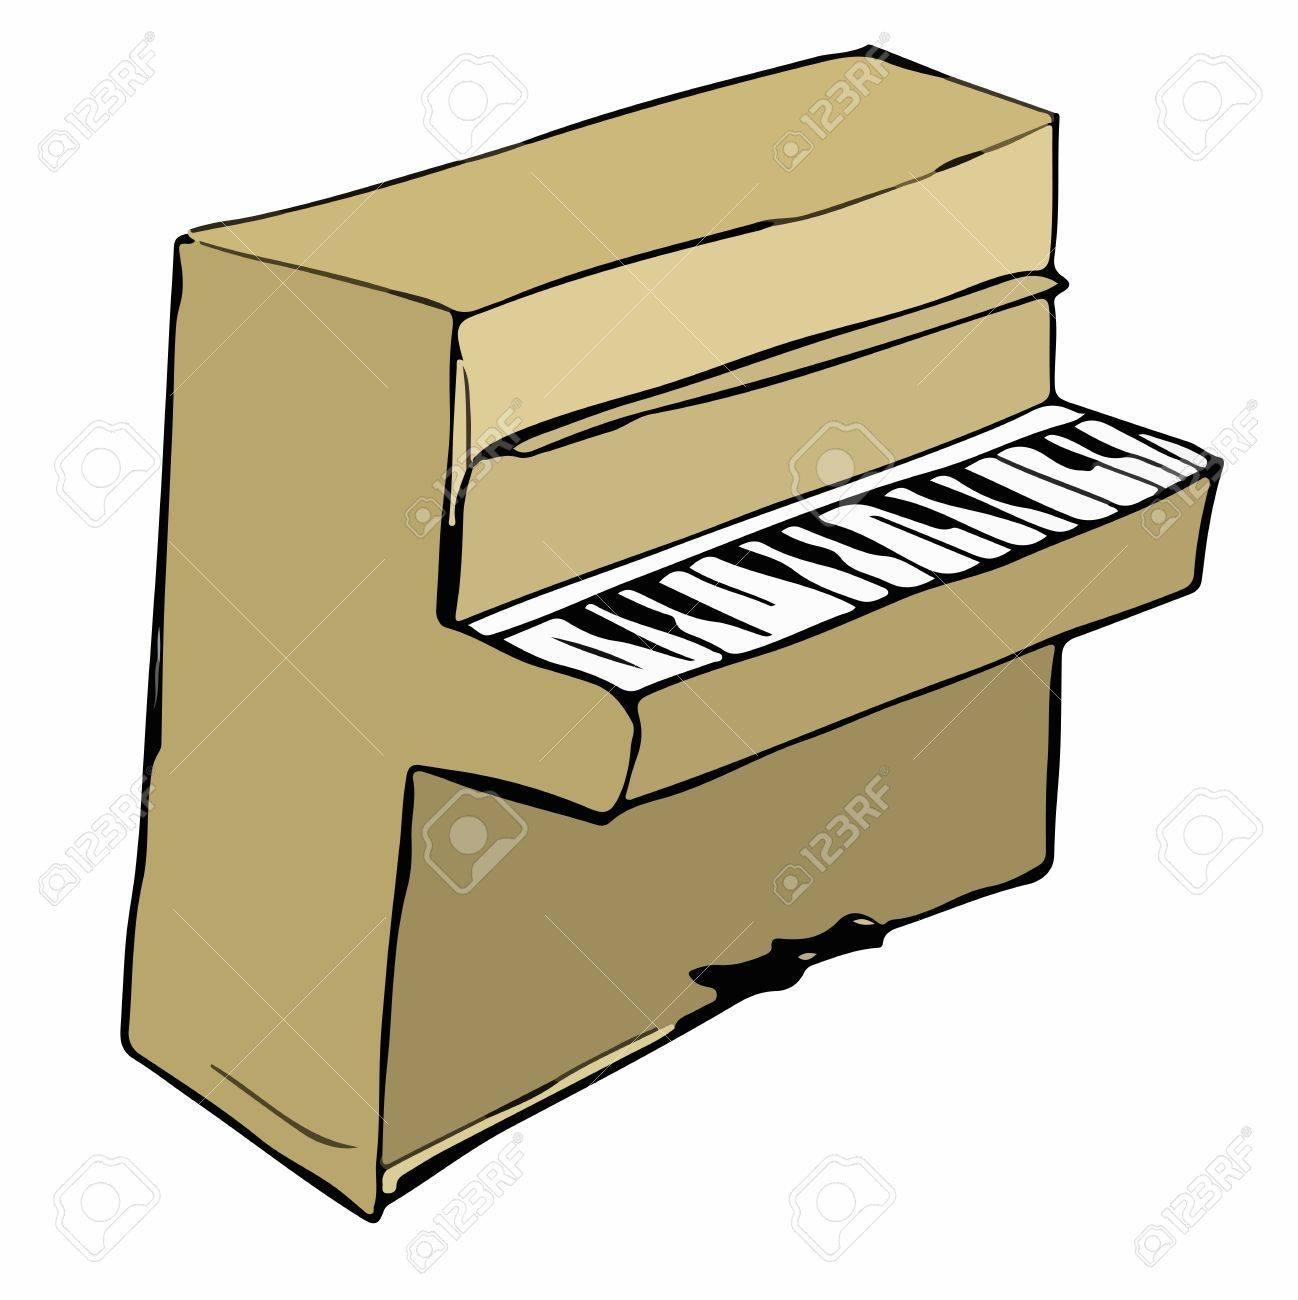 Cartoon illustration of piano Stock Vector - 20982556